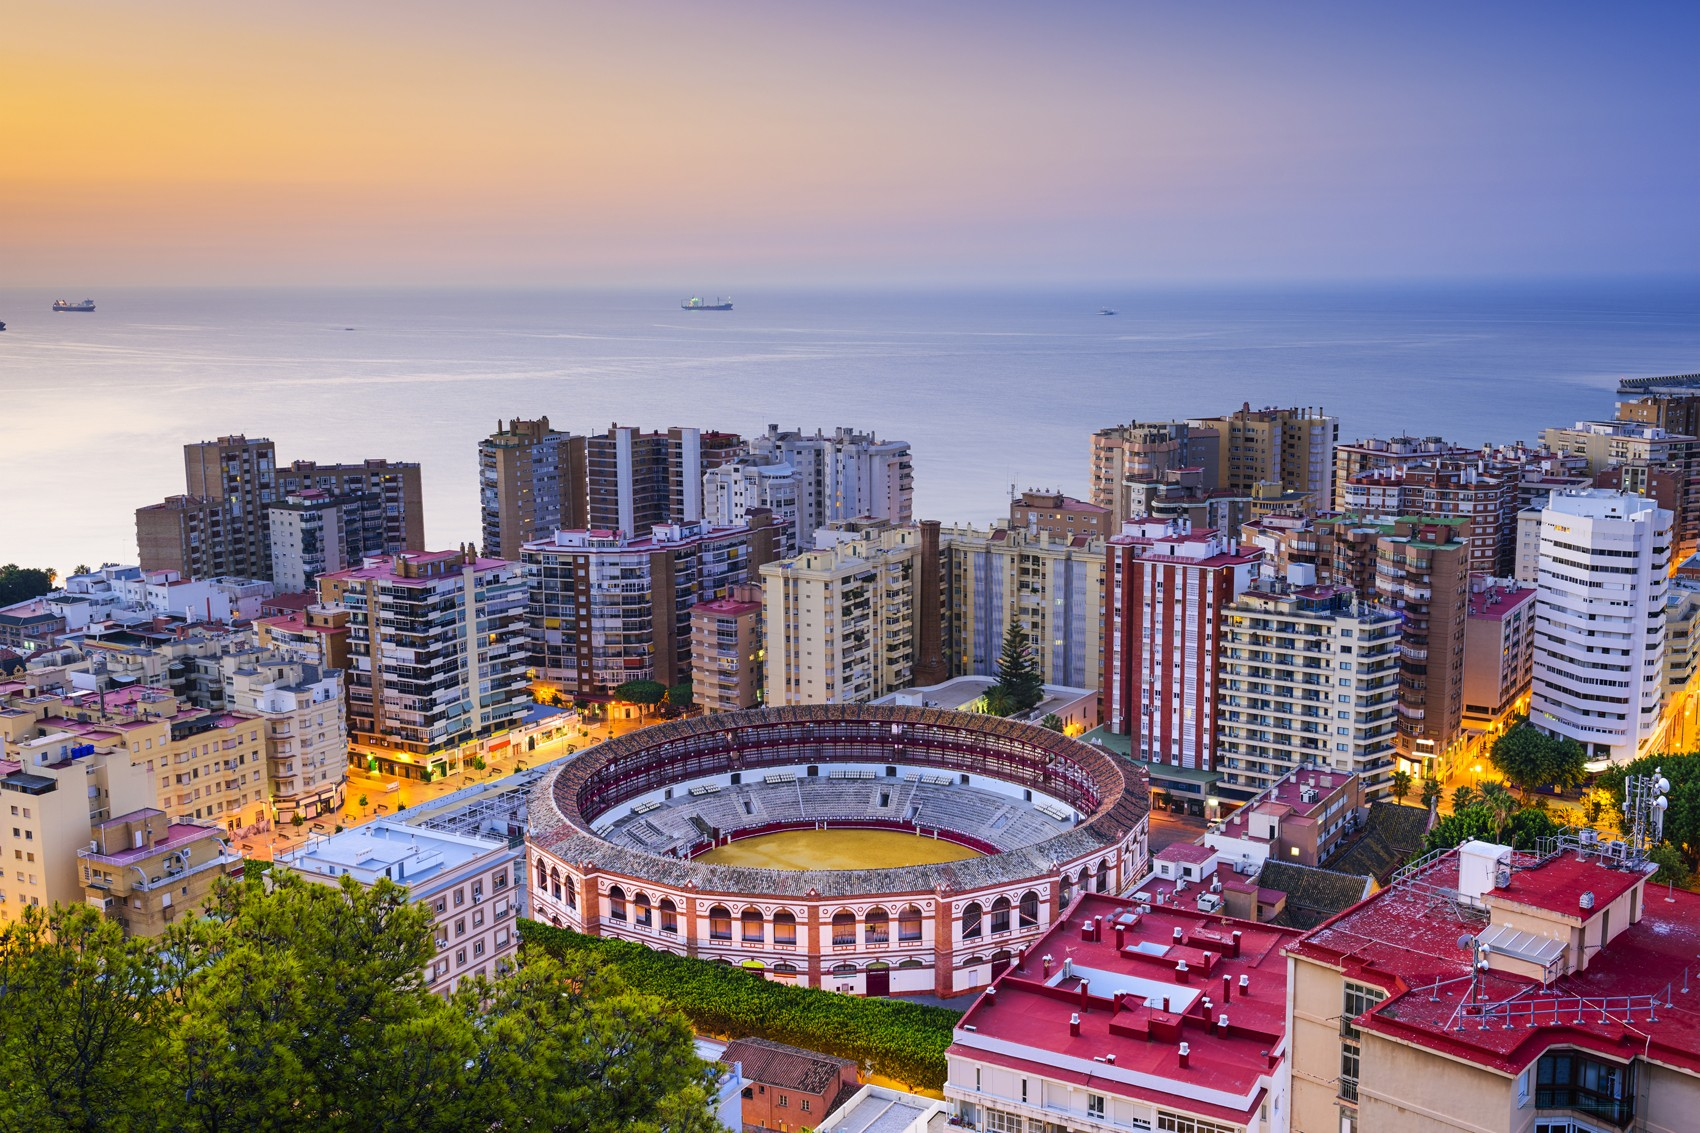 Málaga on southern Spain's Costa del Sol